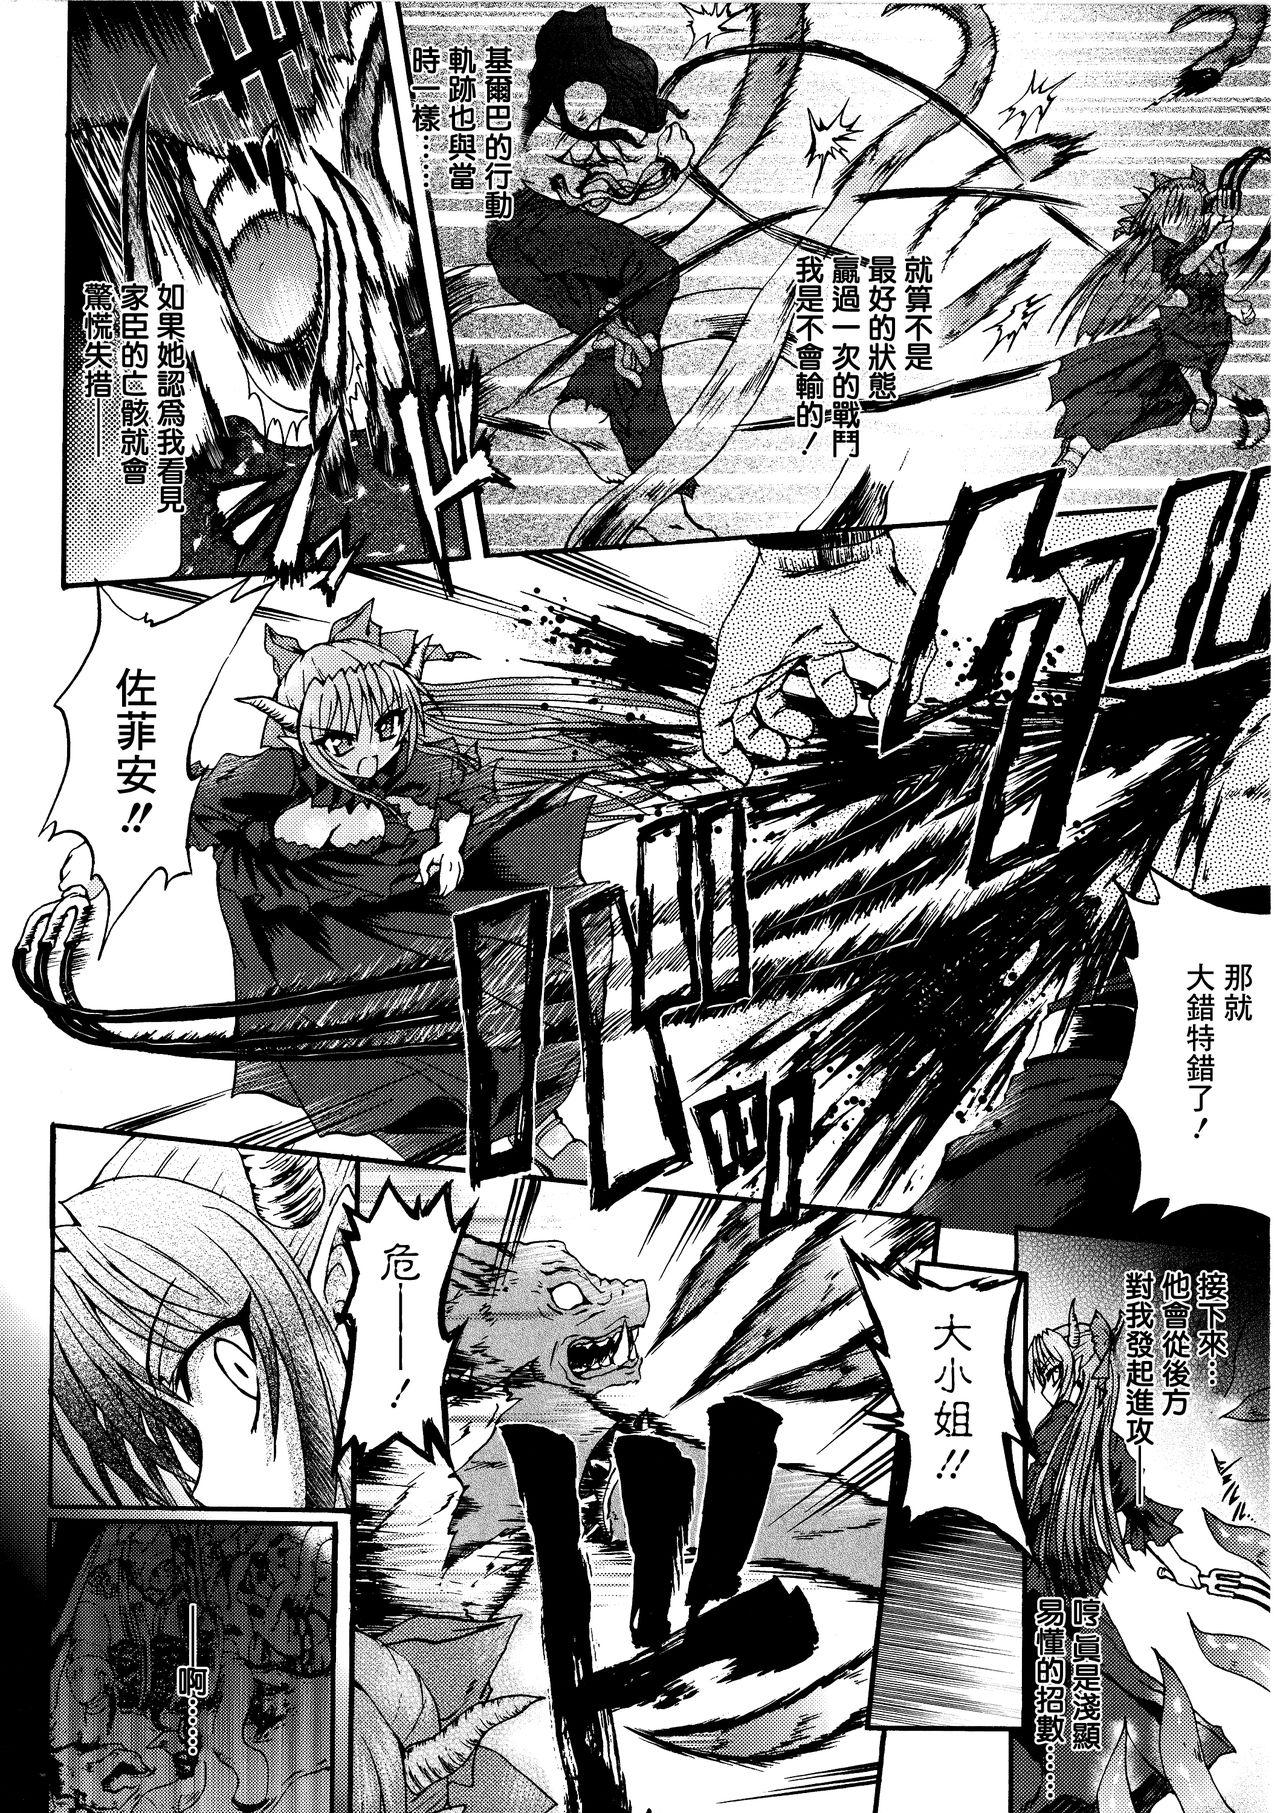 Ma ga Ochiru Yoru Demonic Imitator CH.1-7 128